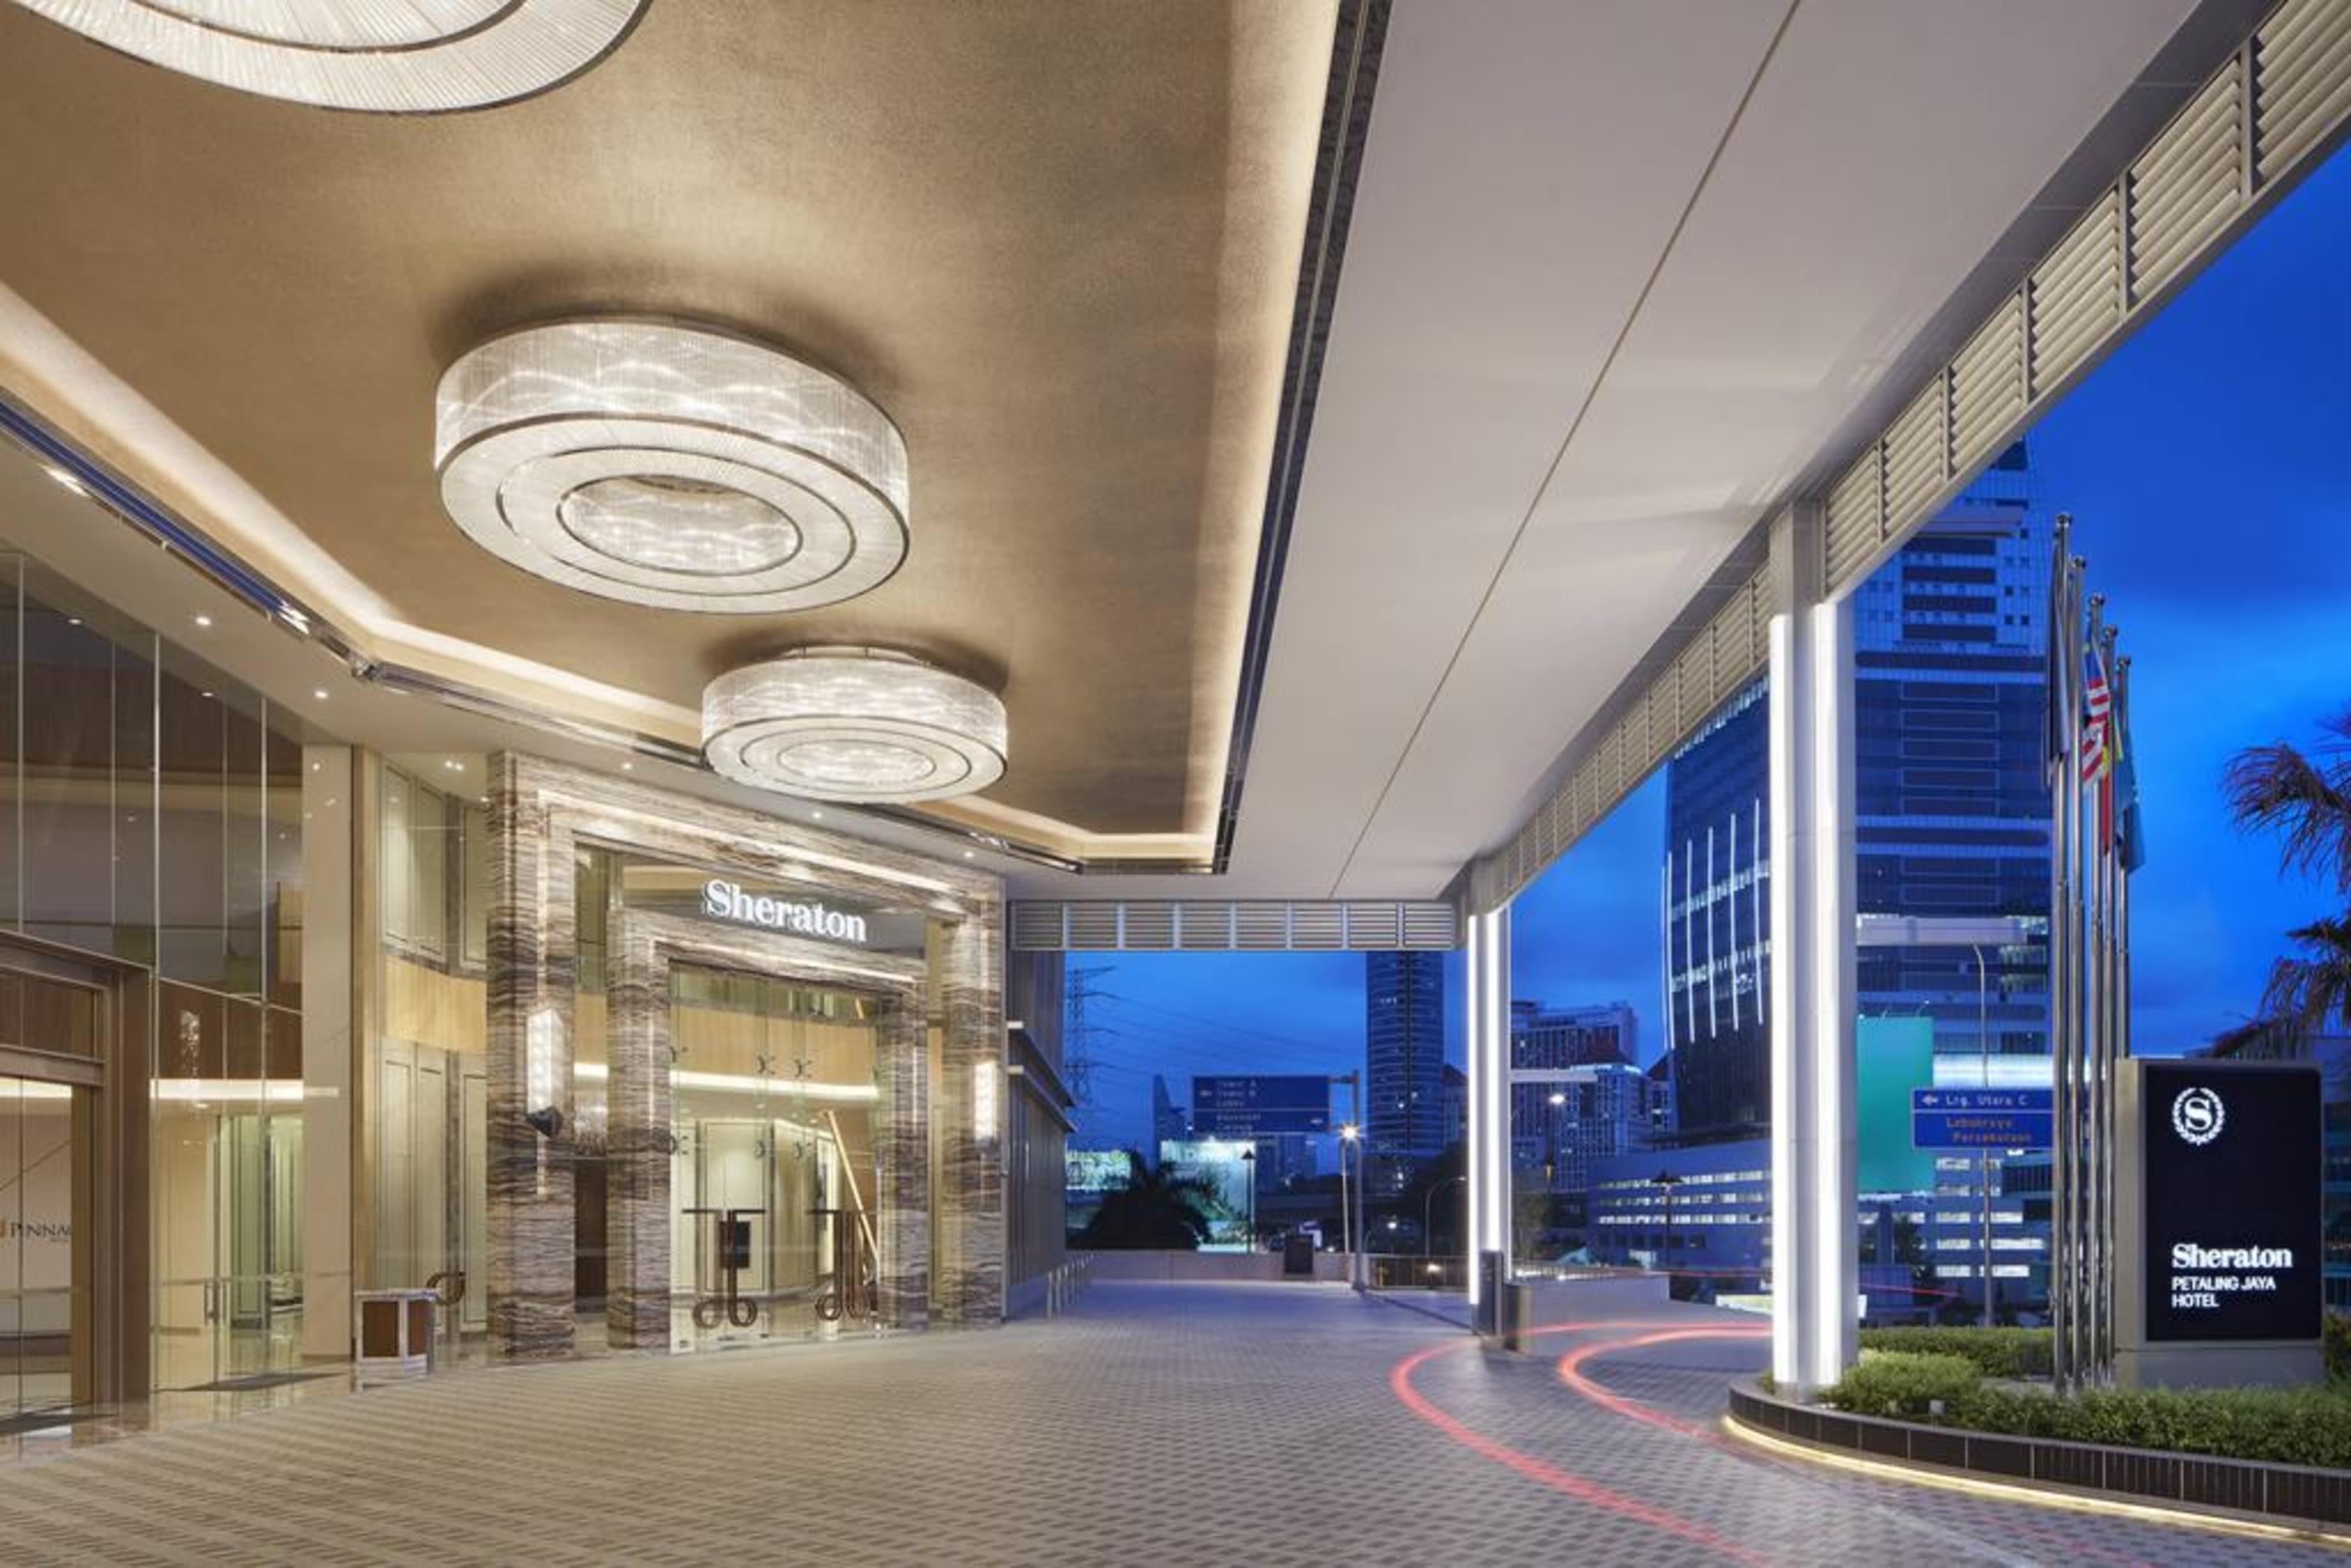 Sheraton Petaling Jaya Hotel, Kuala Lumpur